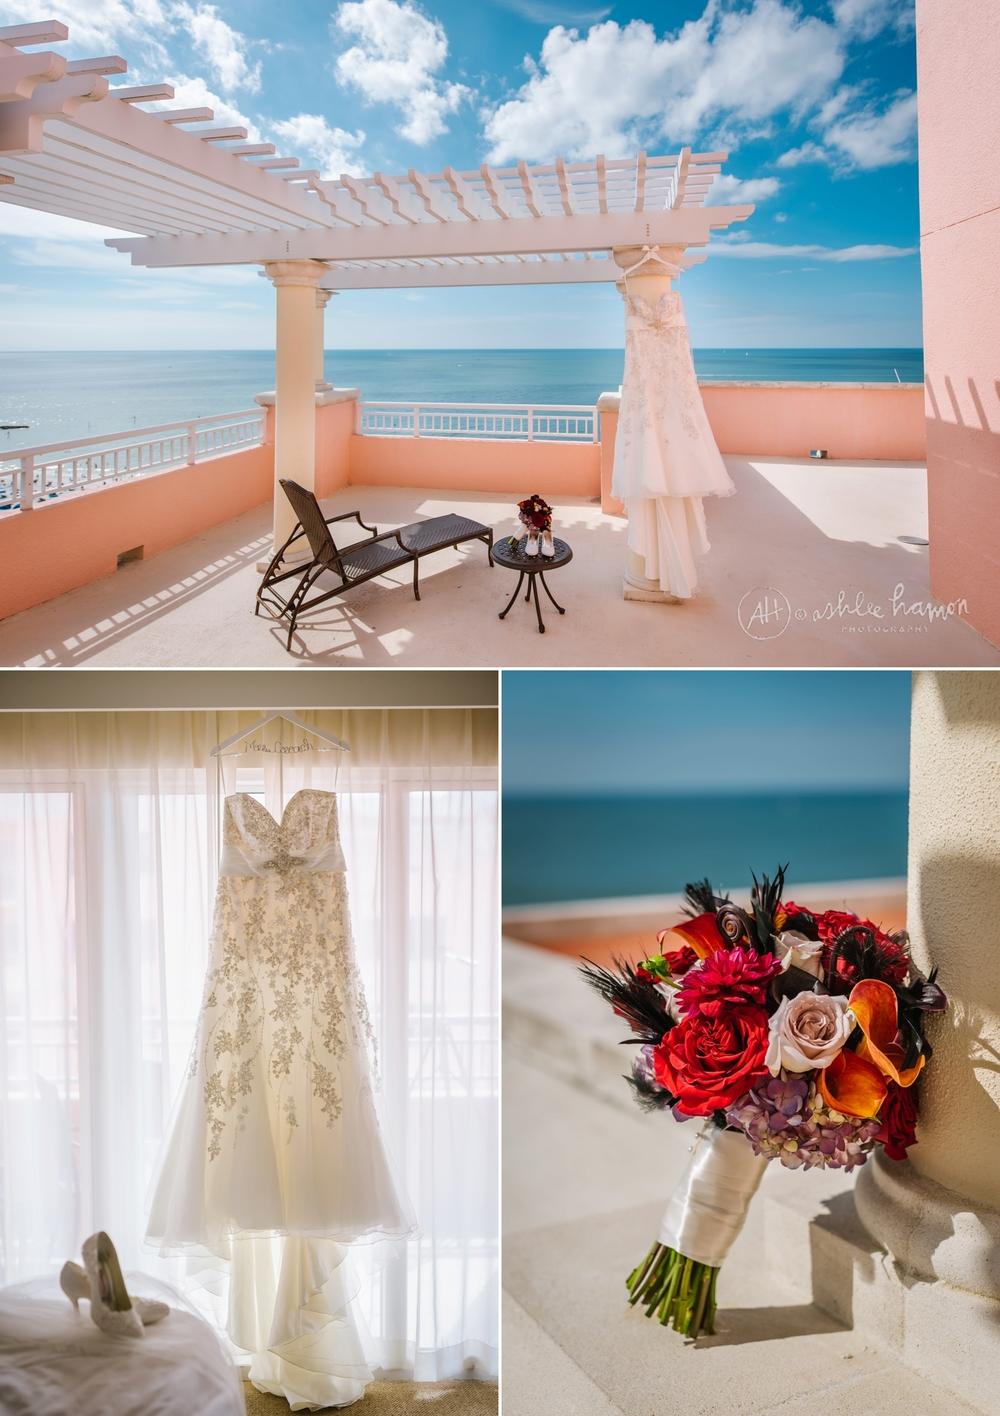 clearwater-beach-hyatt-masquerade-ballroom-themed-wedding-photograpy_0000.jpg